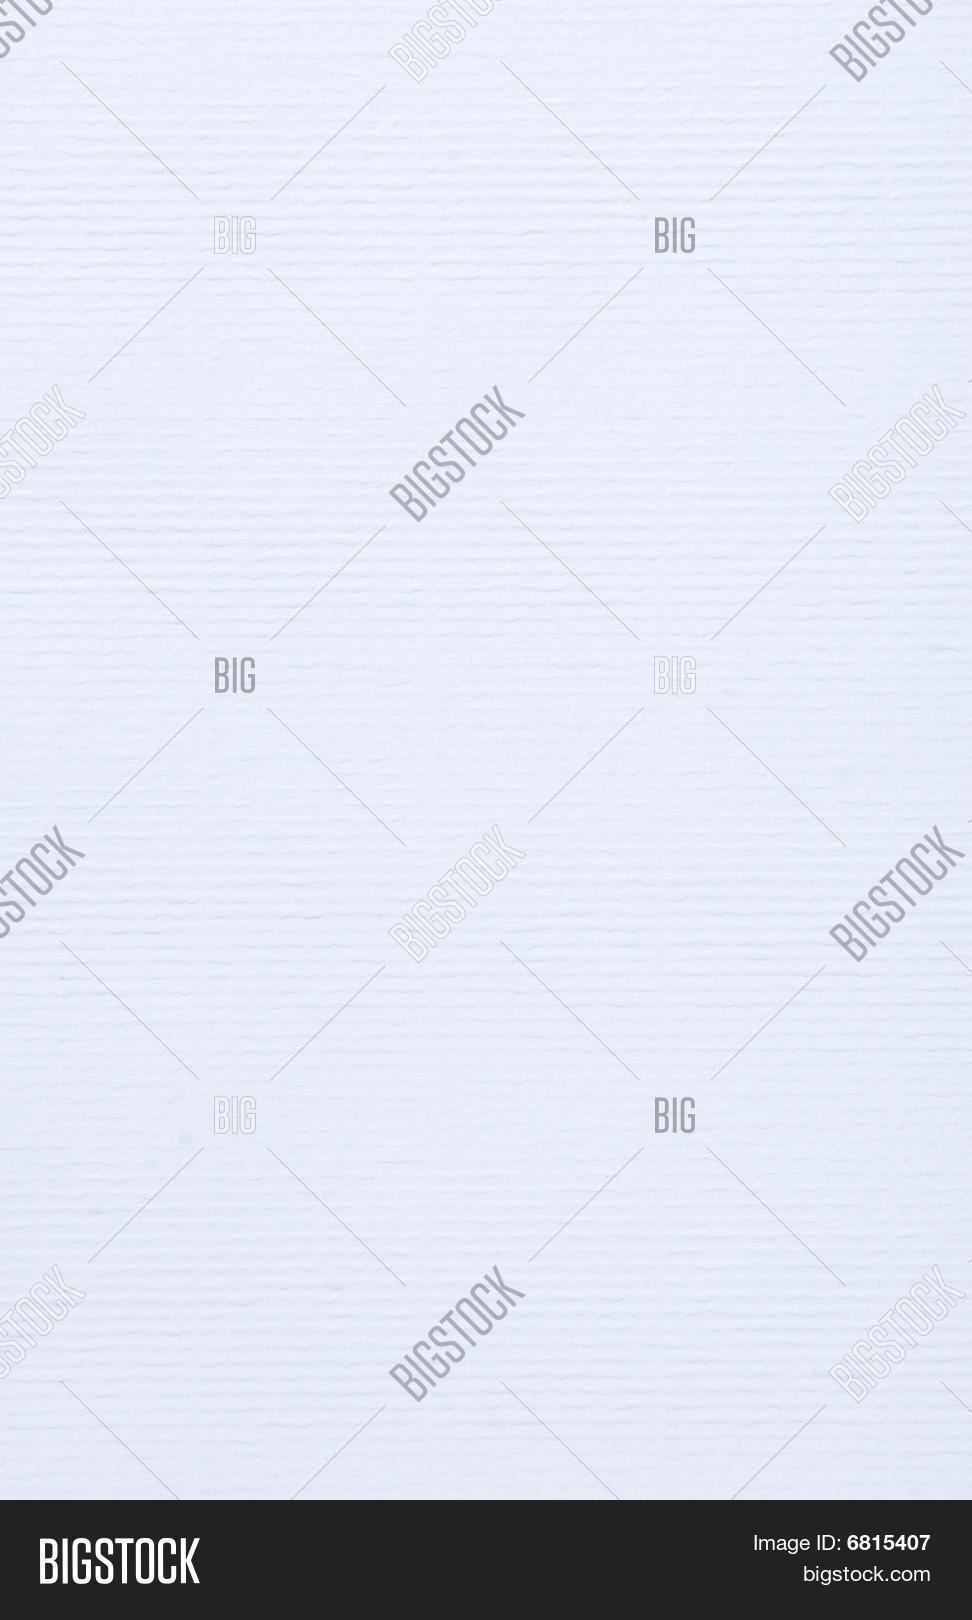 Laid paper texture